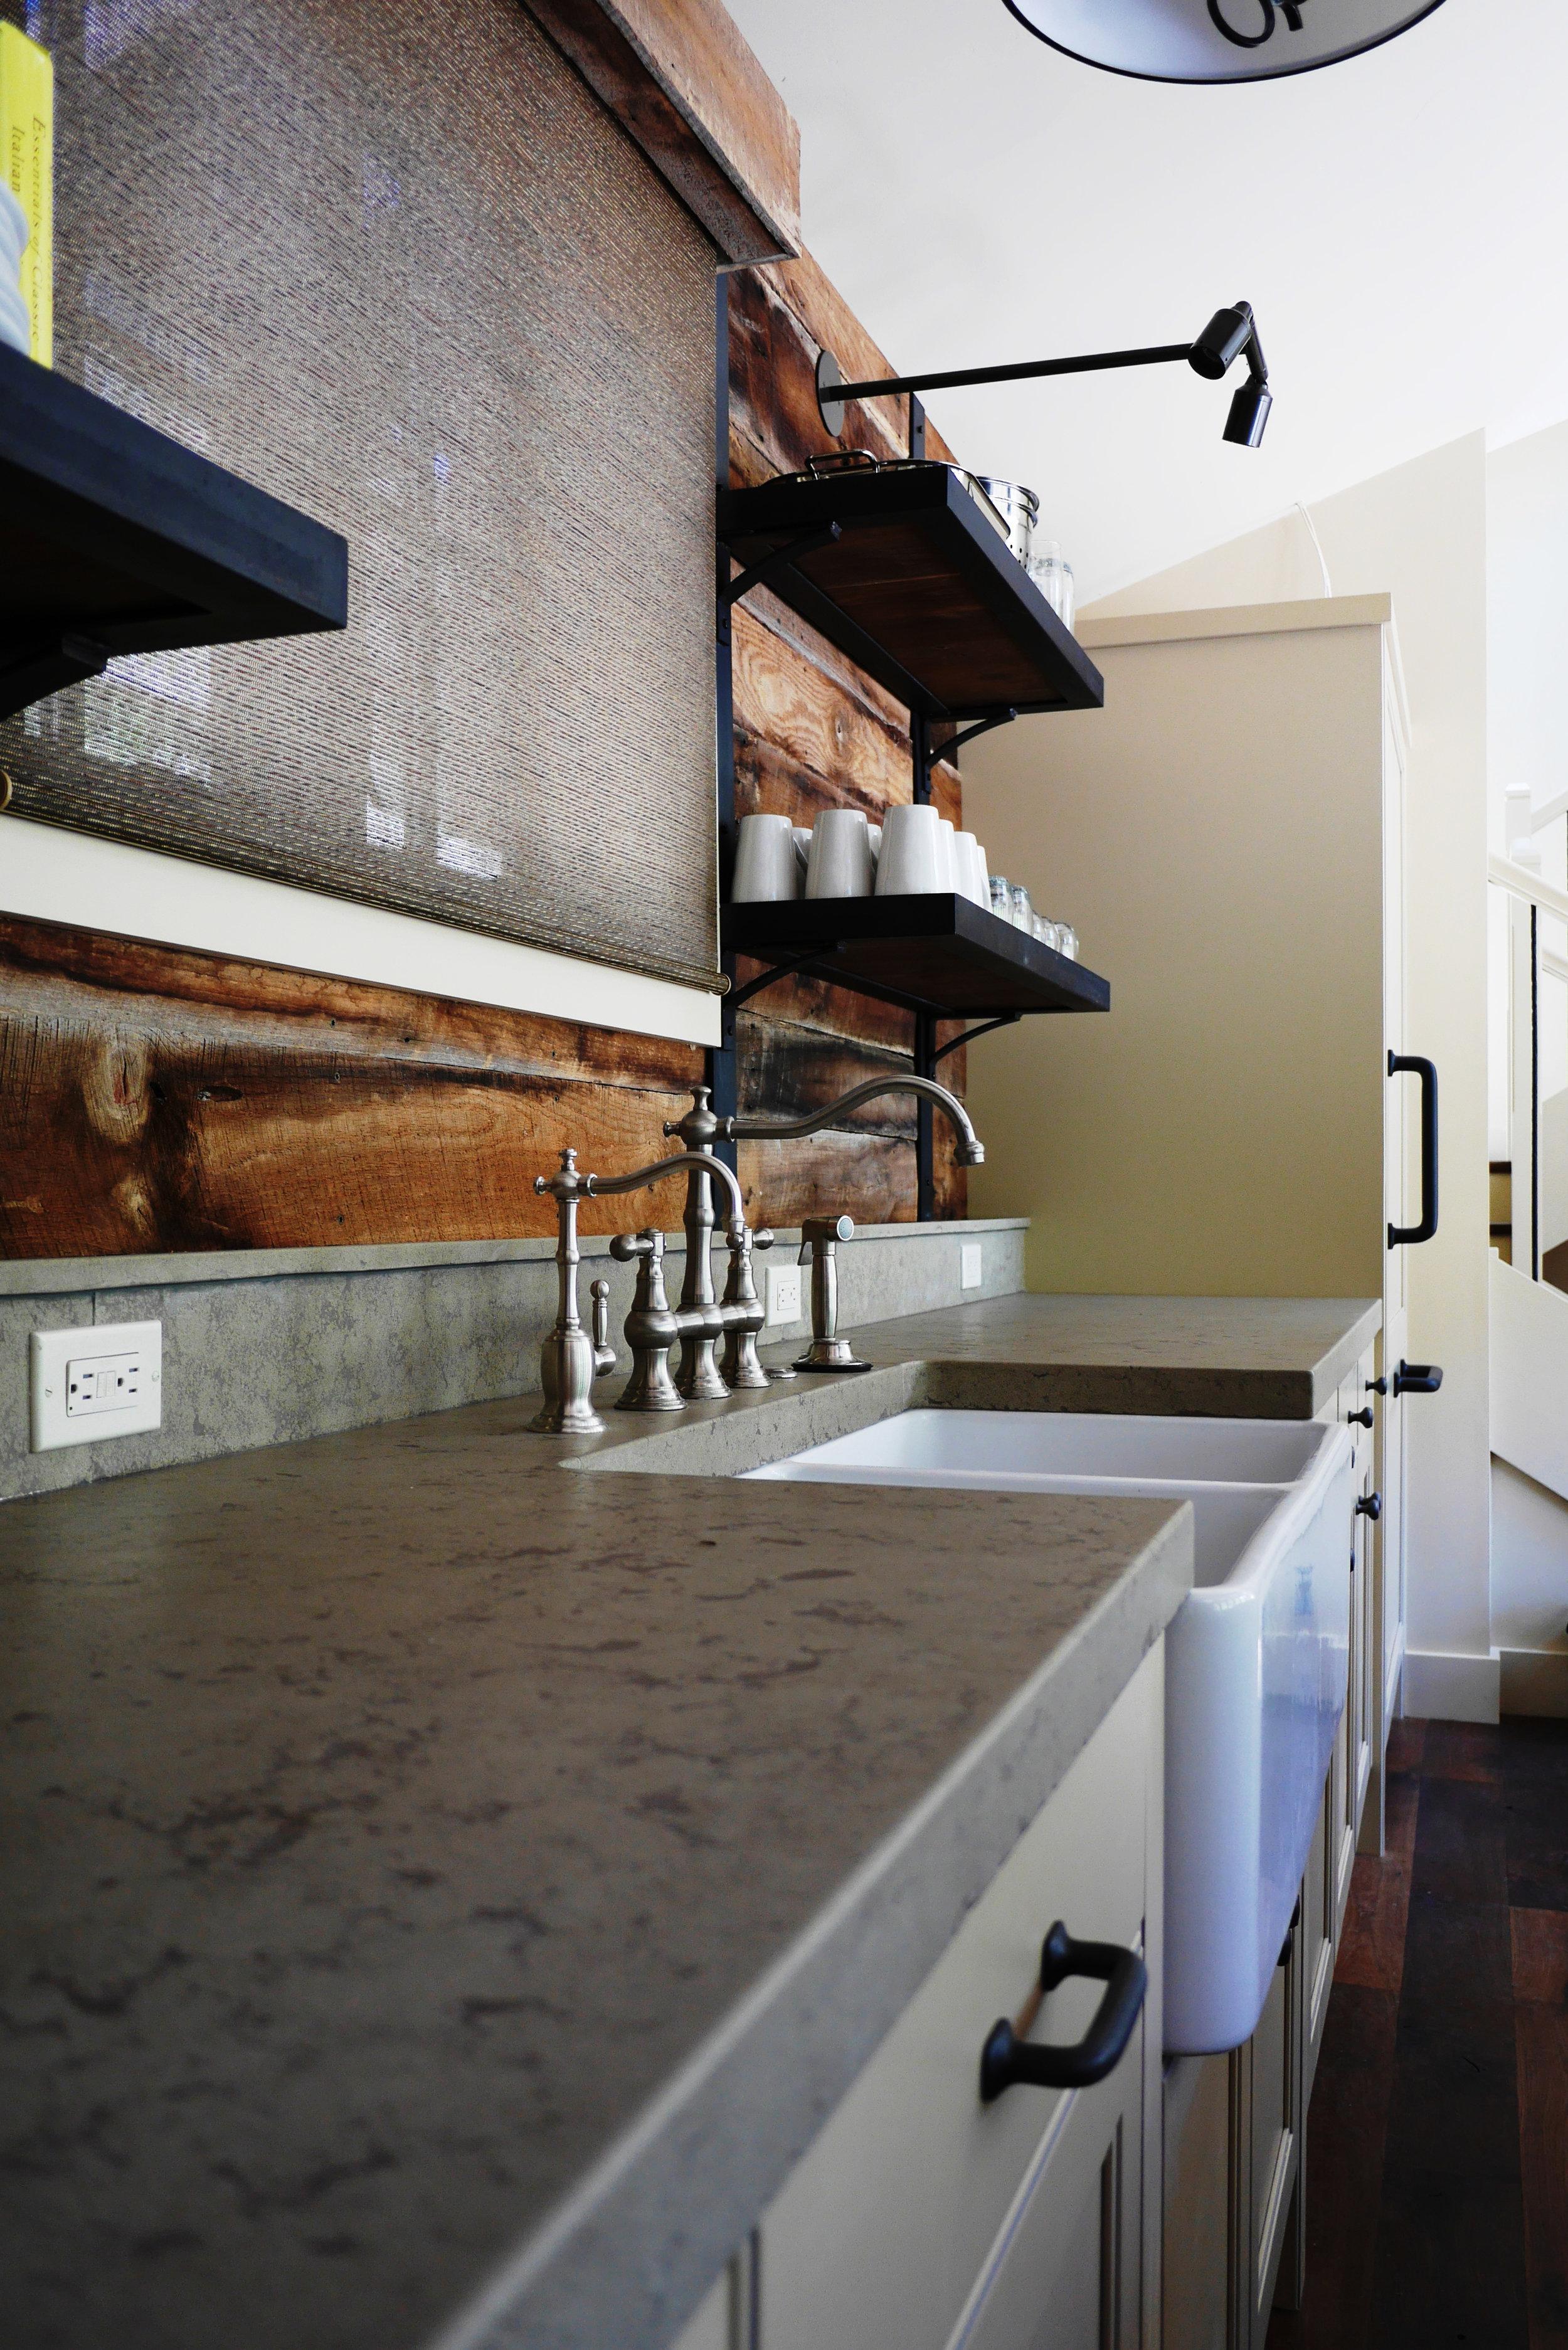 Handpressed Concrete Kitchen Countertops 2.jpg